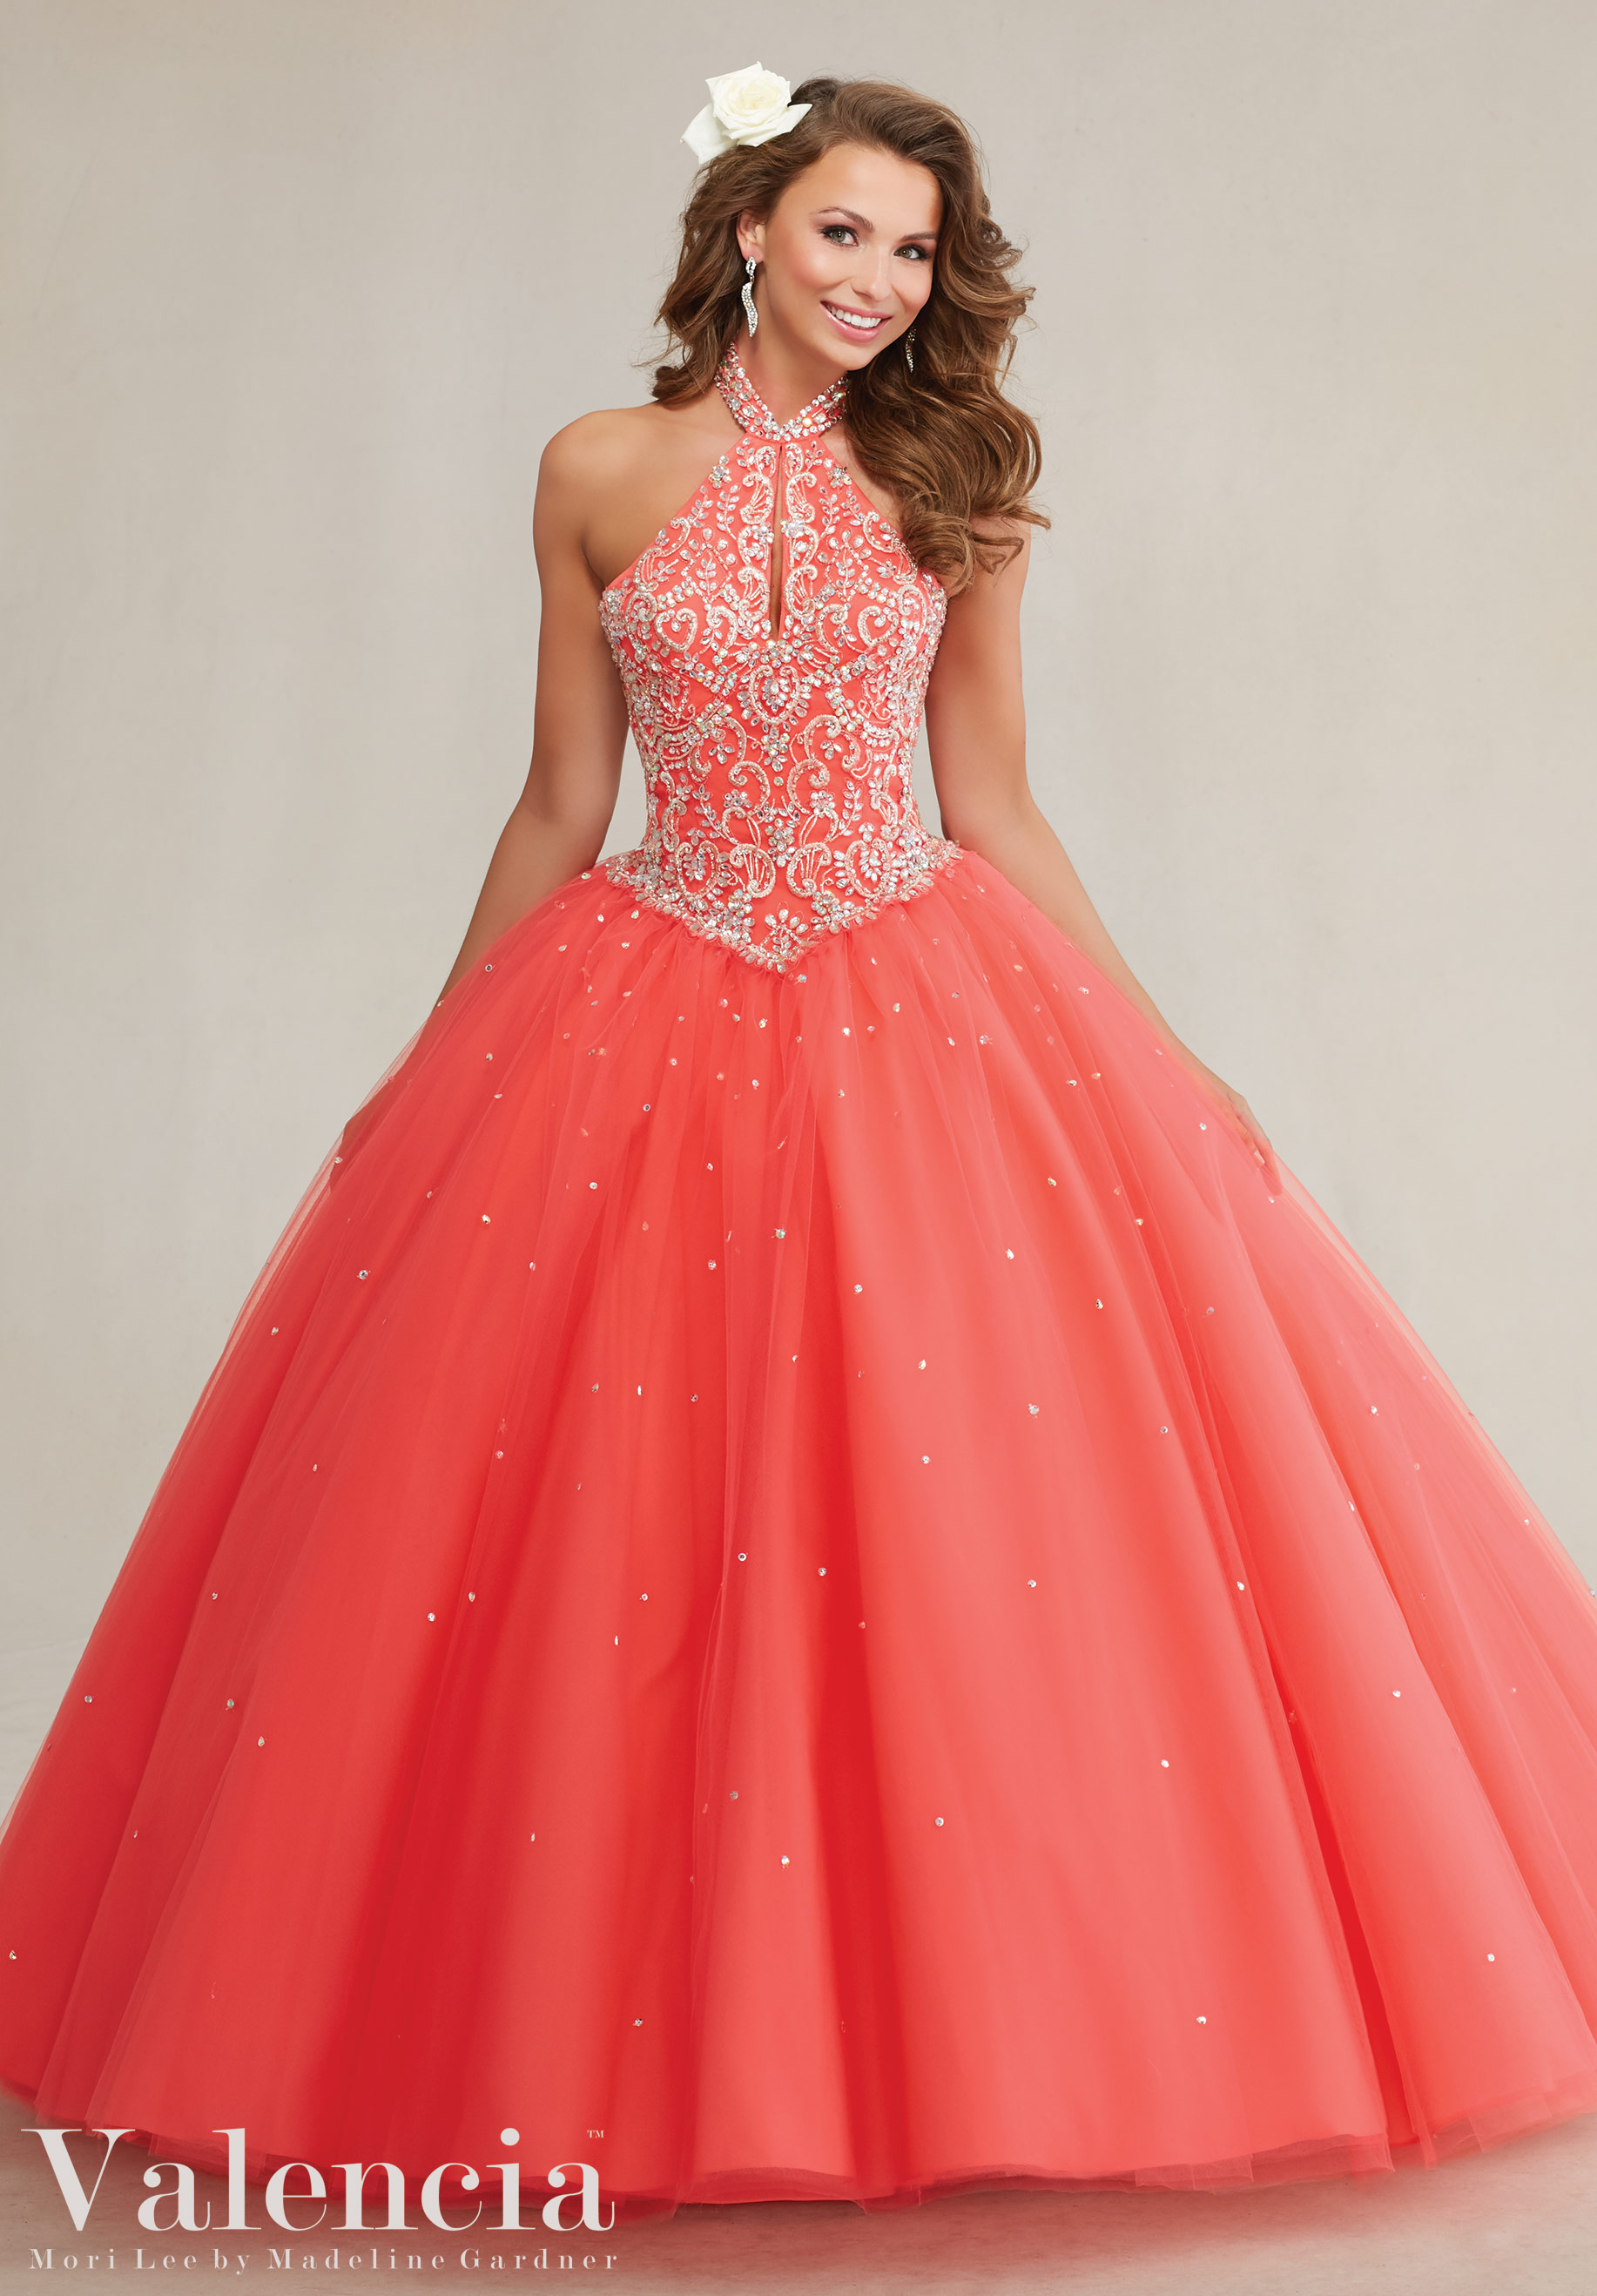 28008049ad0 Quinceañera Dresses – Celebrations de todo